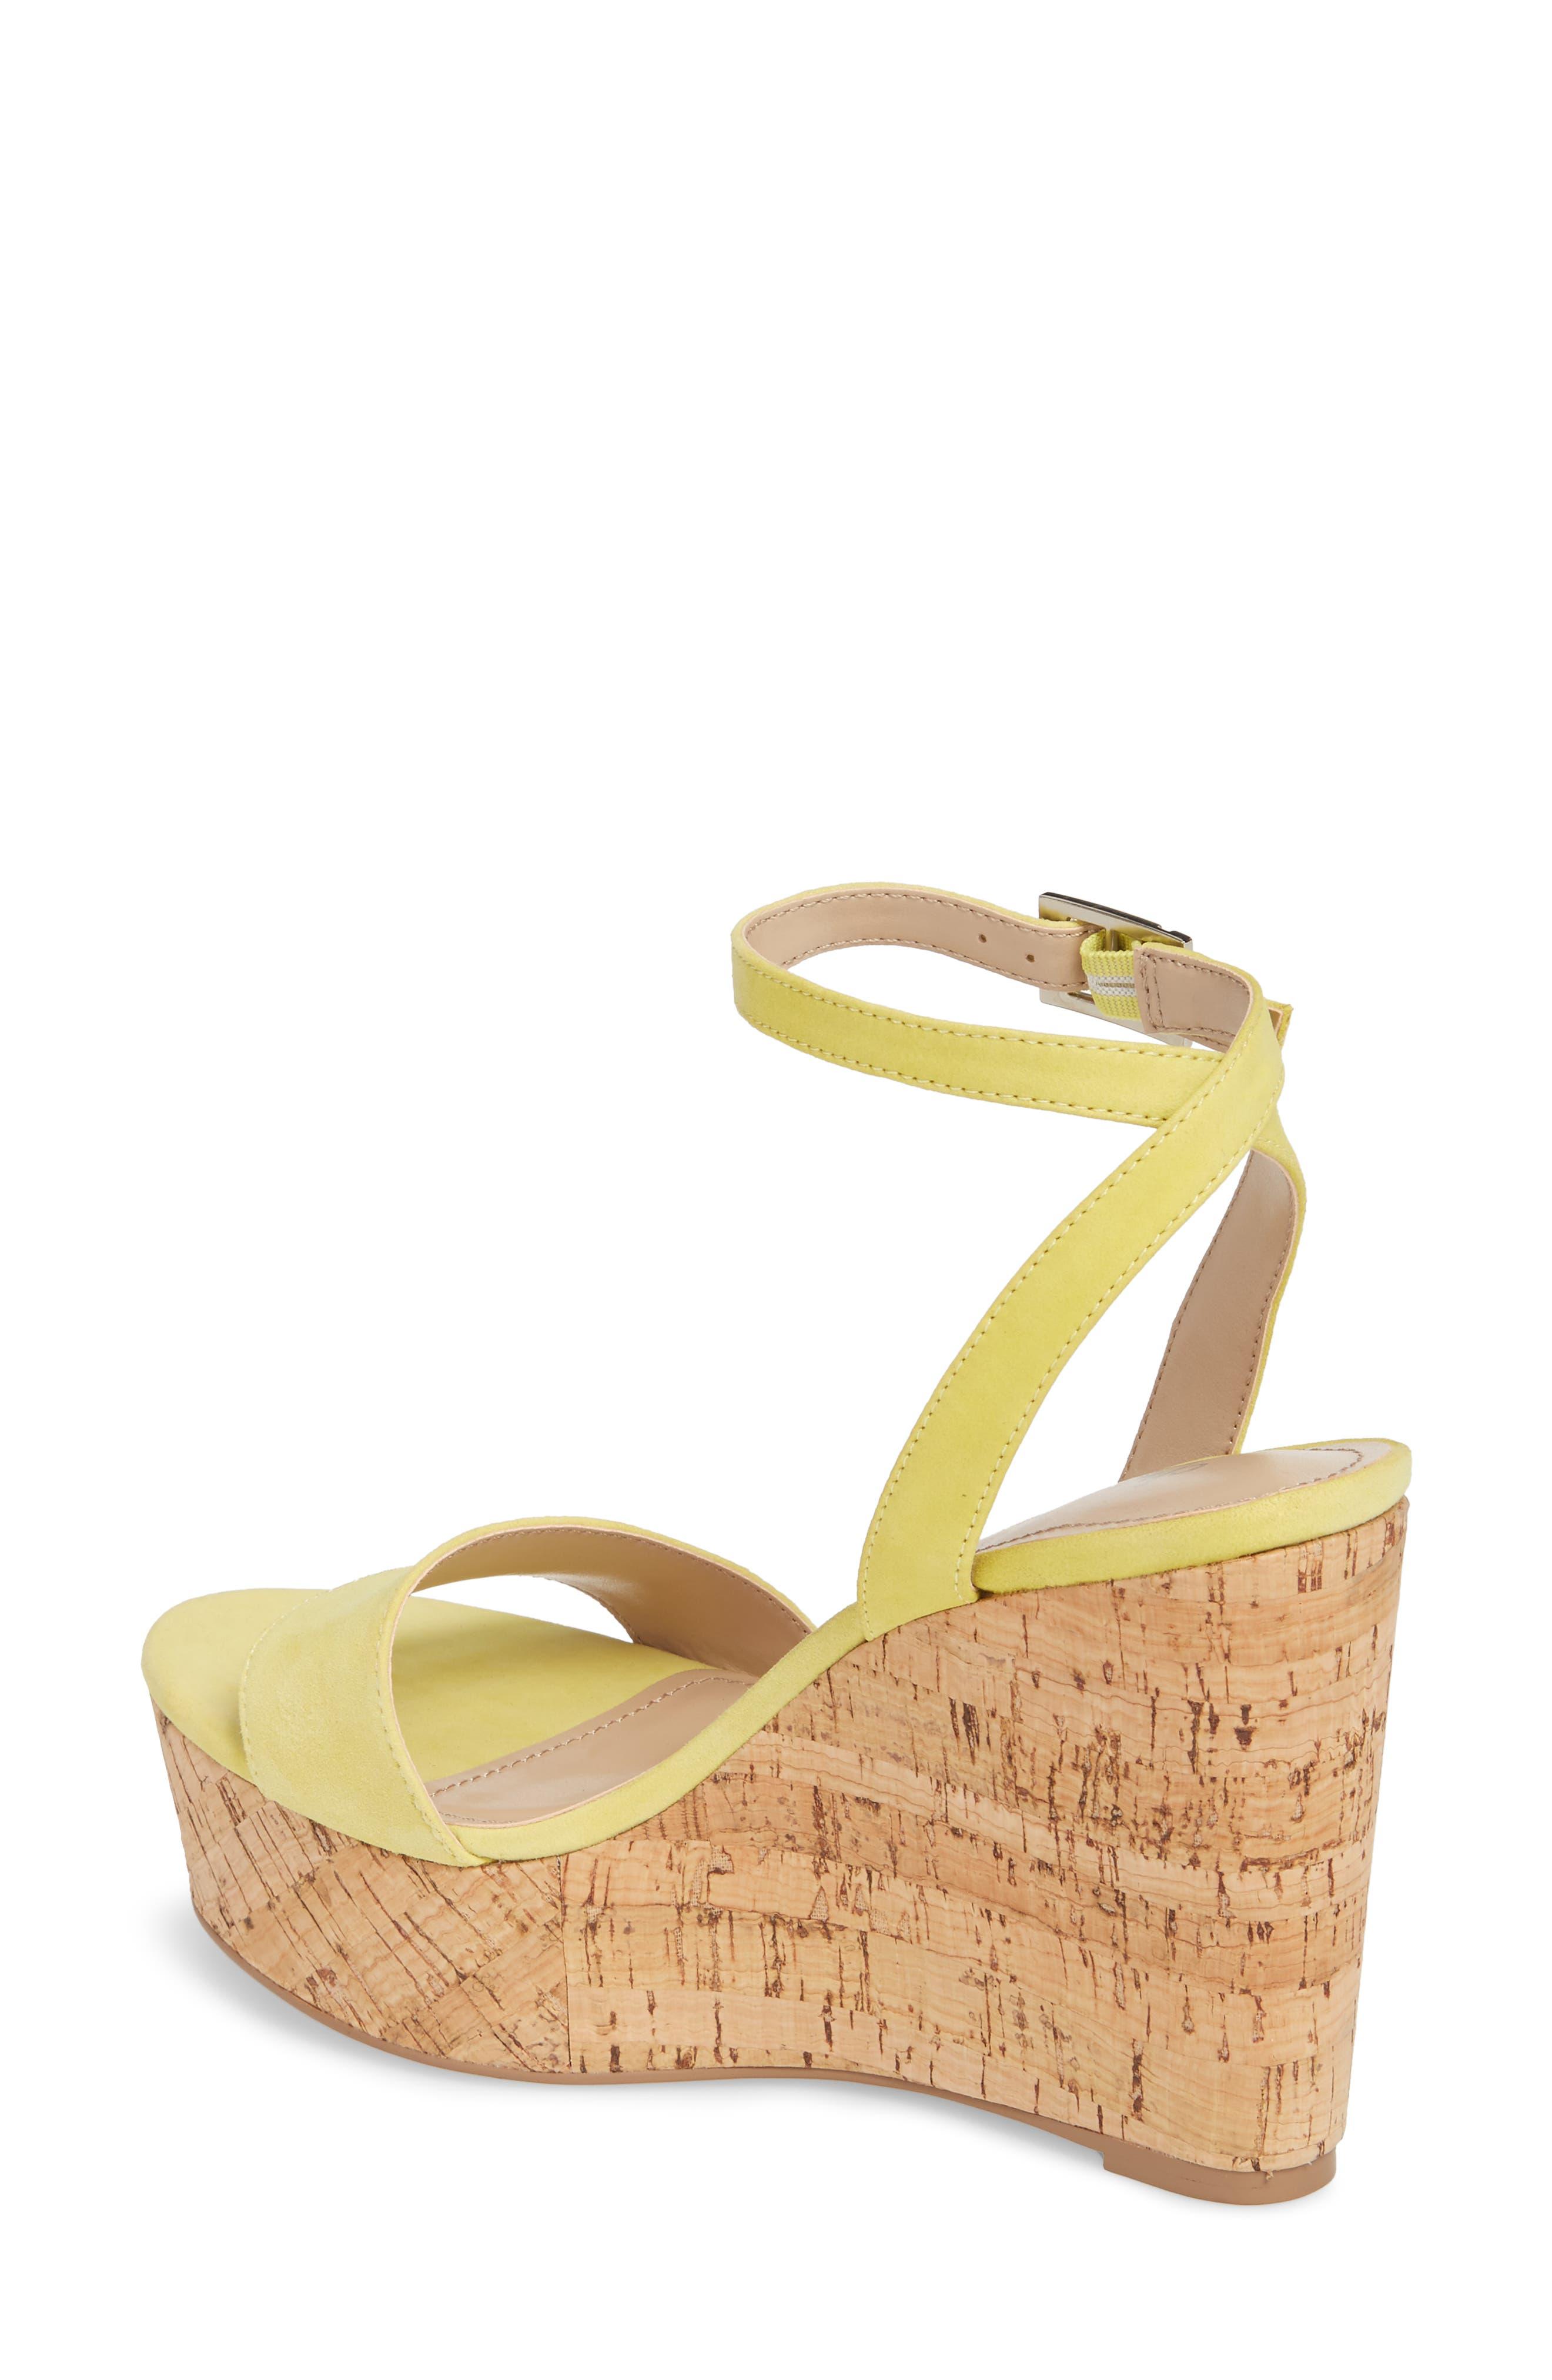 Lilla Platform Wedge Sandal,                             Alternate thumbnail 2, color,                             Yellow Suede